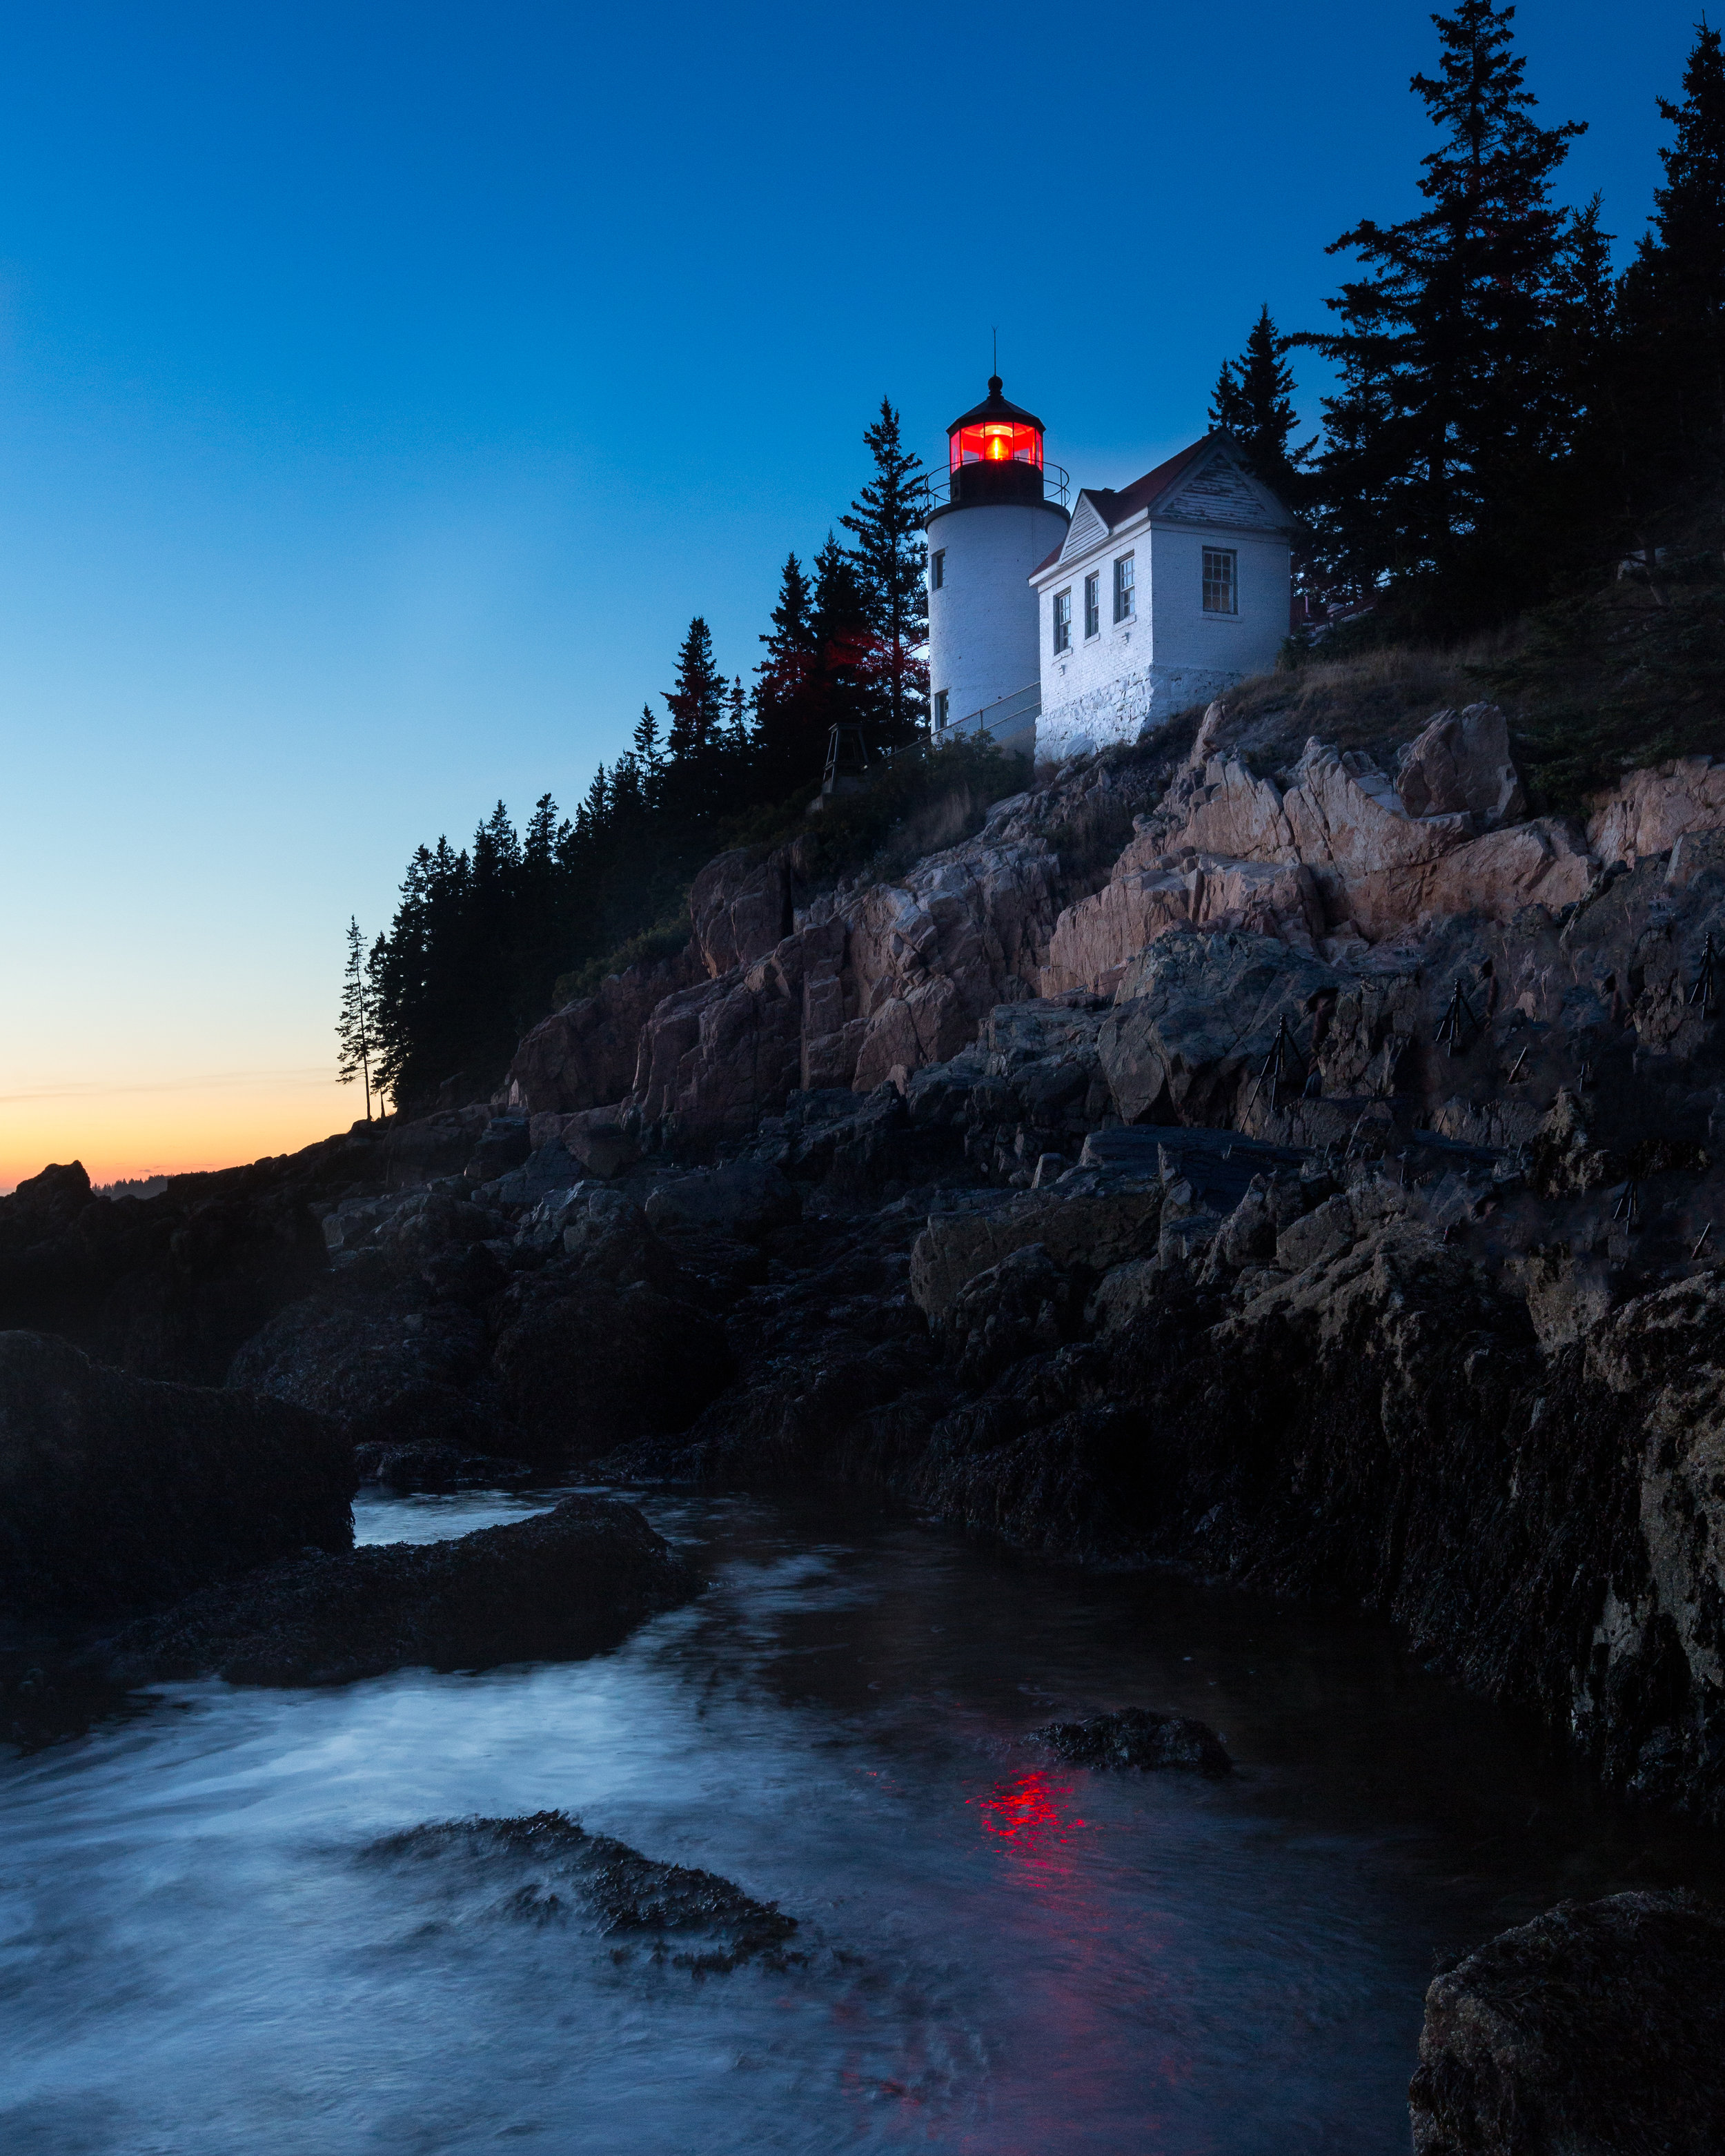 Bass Harbor Light ISO 1000 / 28mm / f11 / 1.6 sec